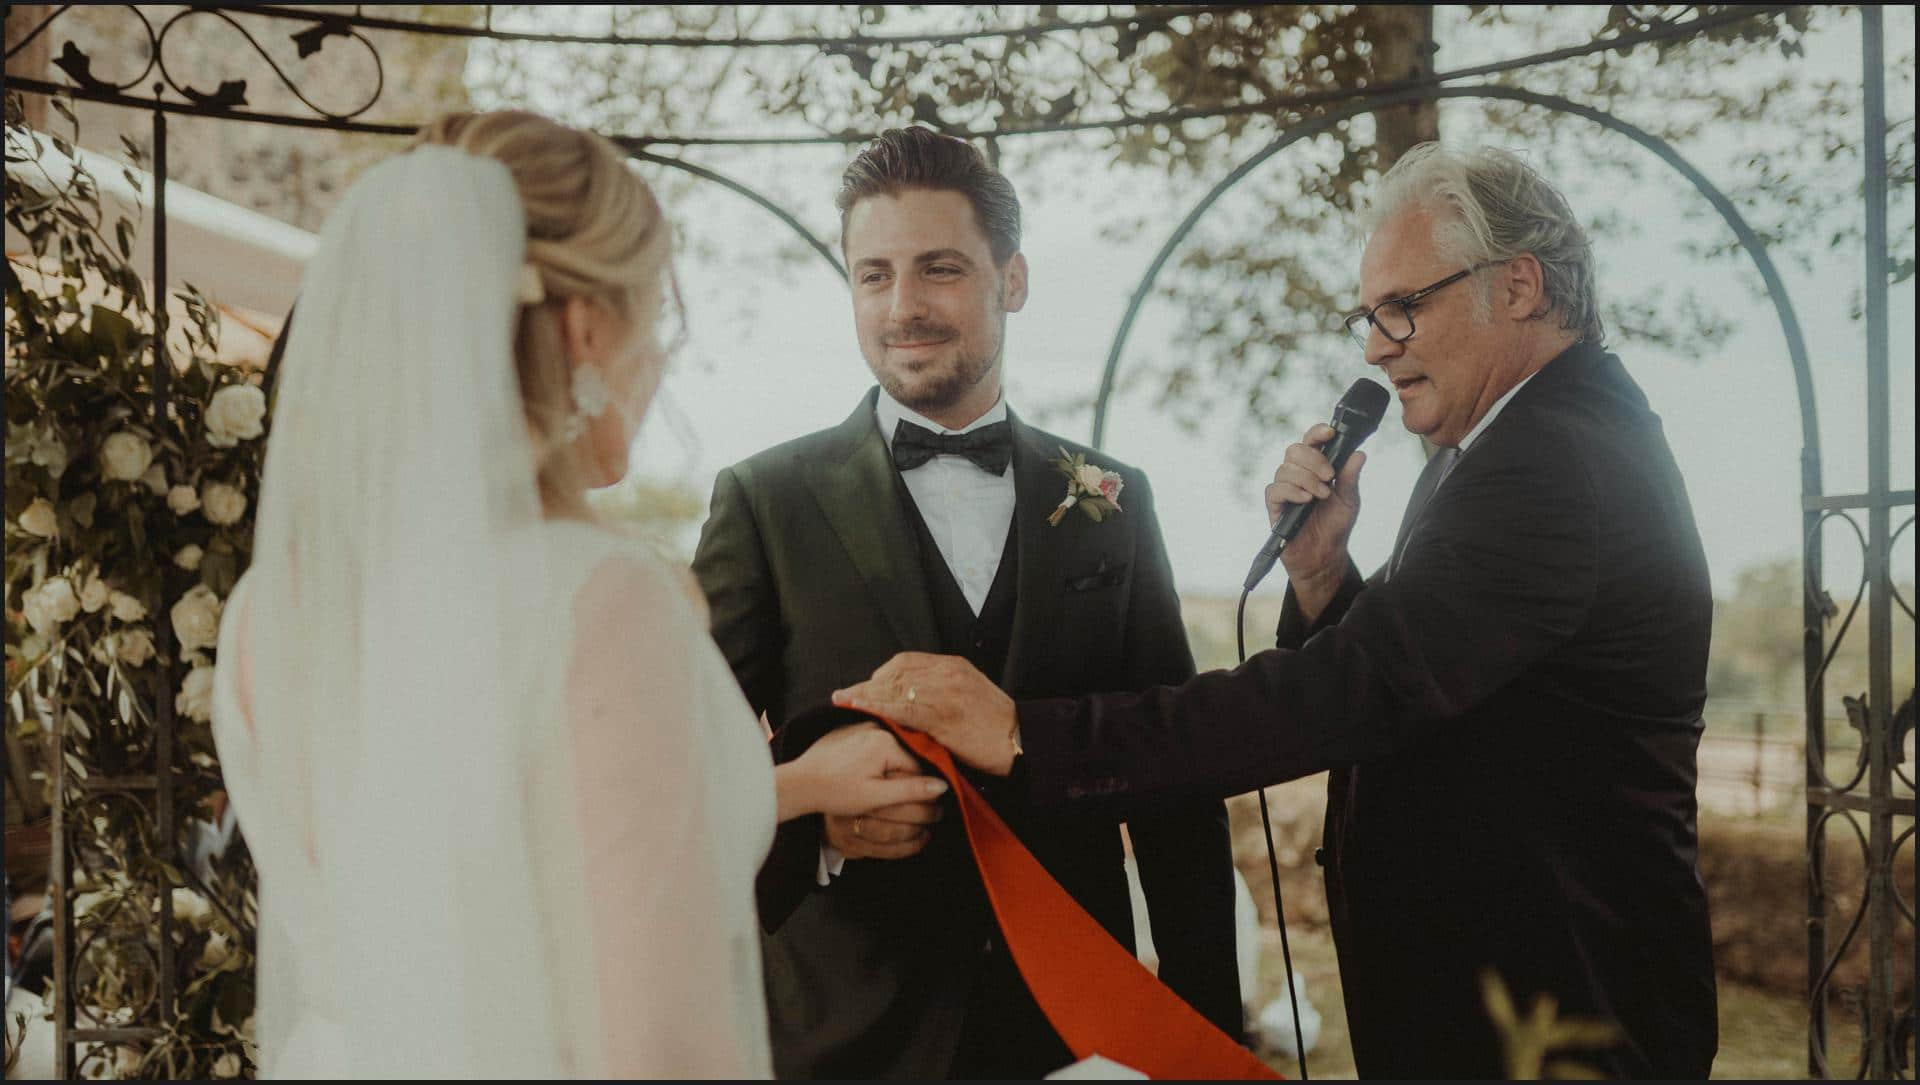 borgo di tragliata, wedding, rome, wedding in rome, celebrant, ceremony, destination wedding, italy wedding photographer